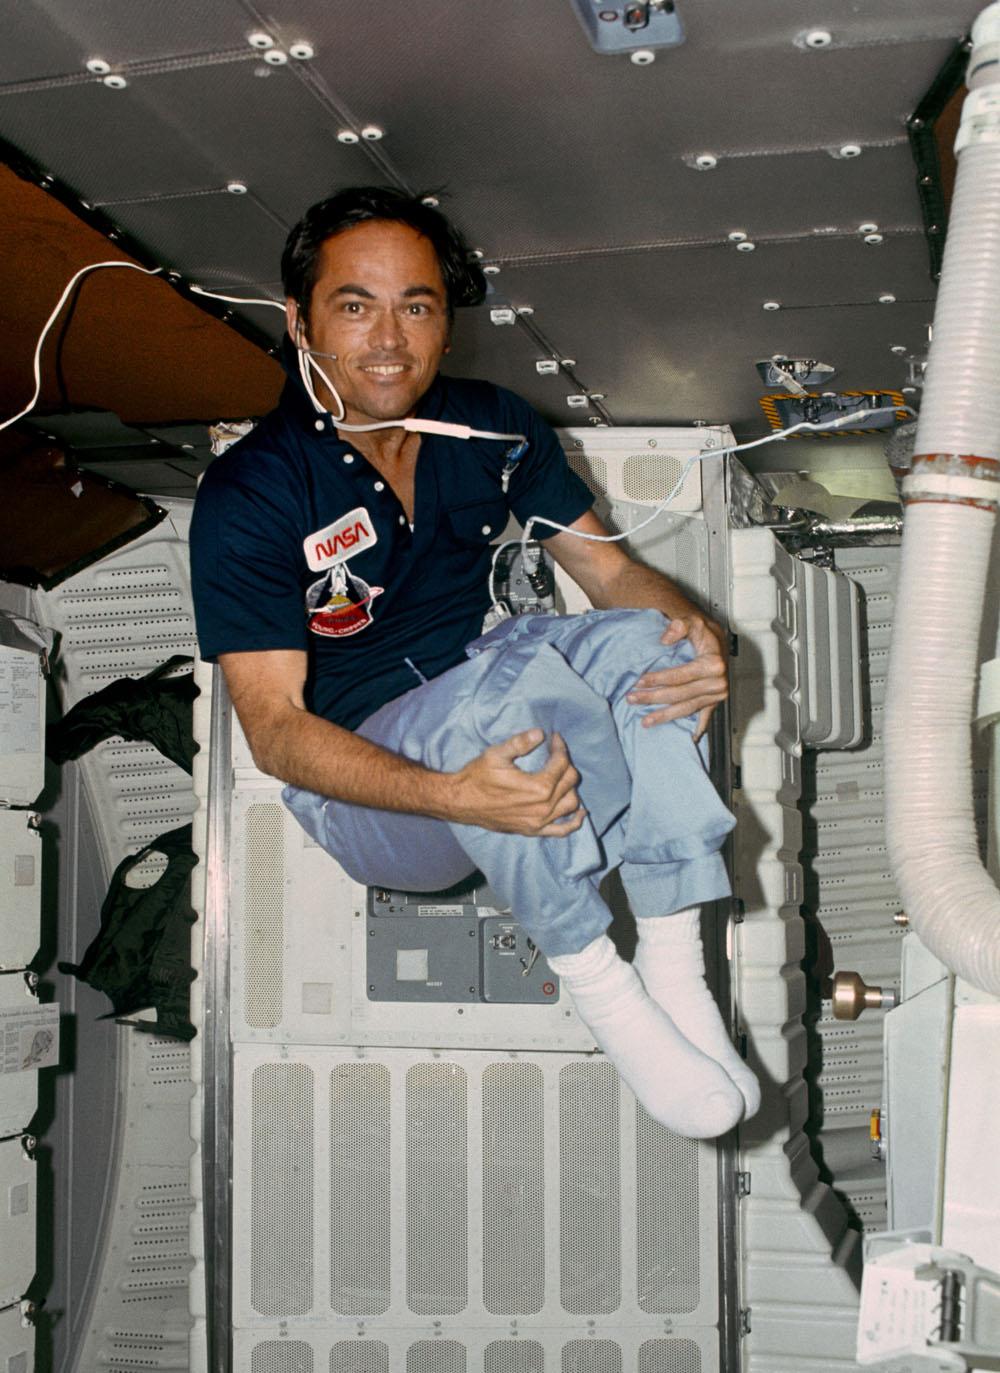 Columbia's Space Pilot